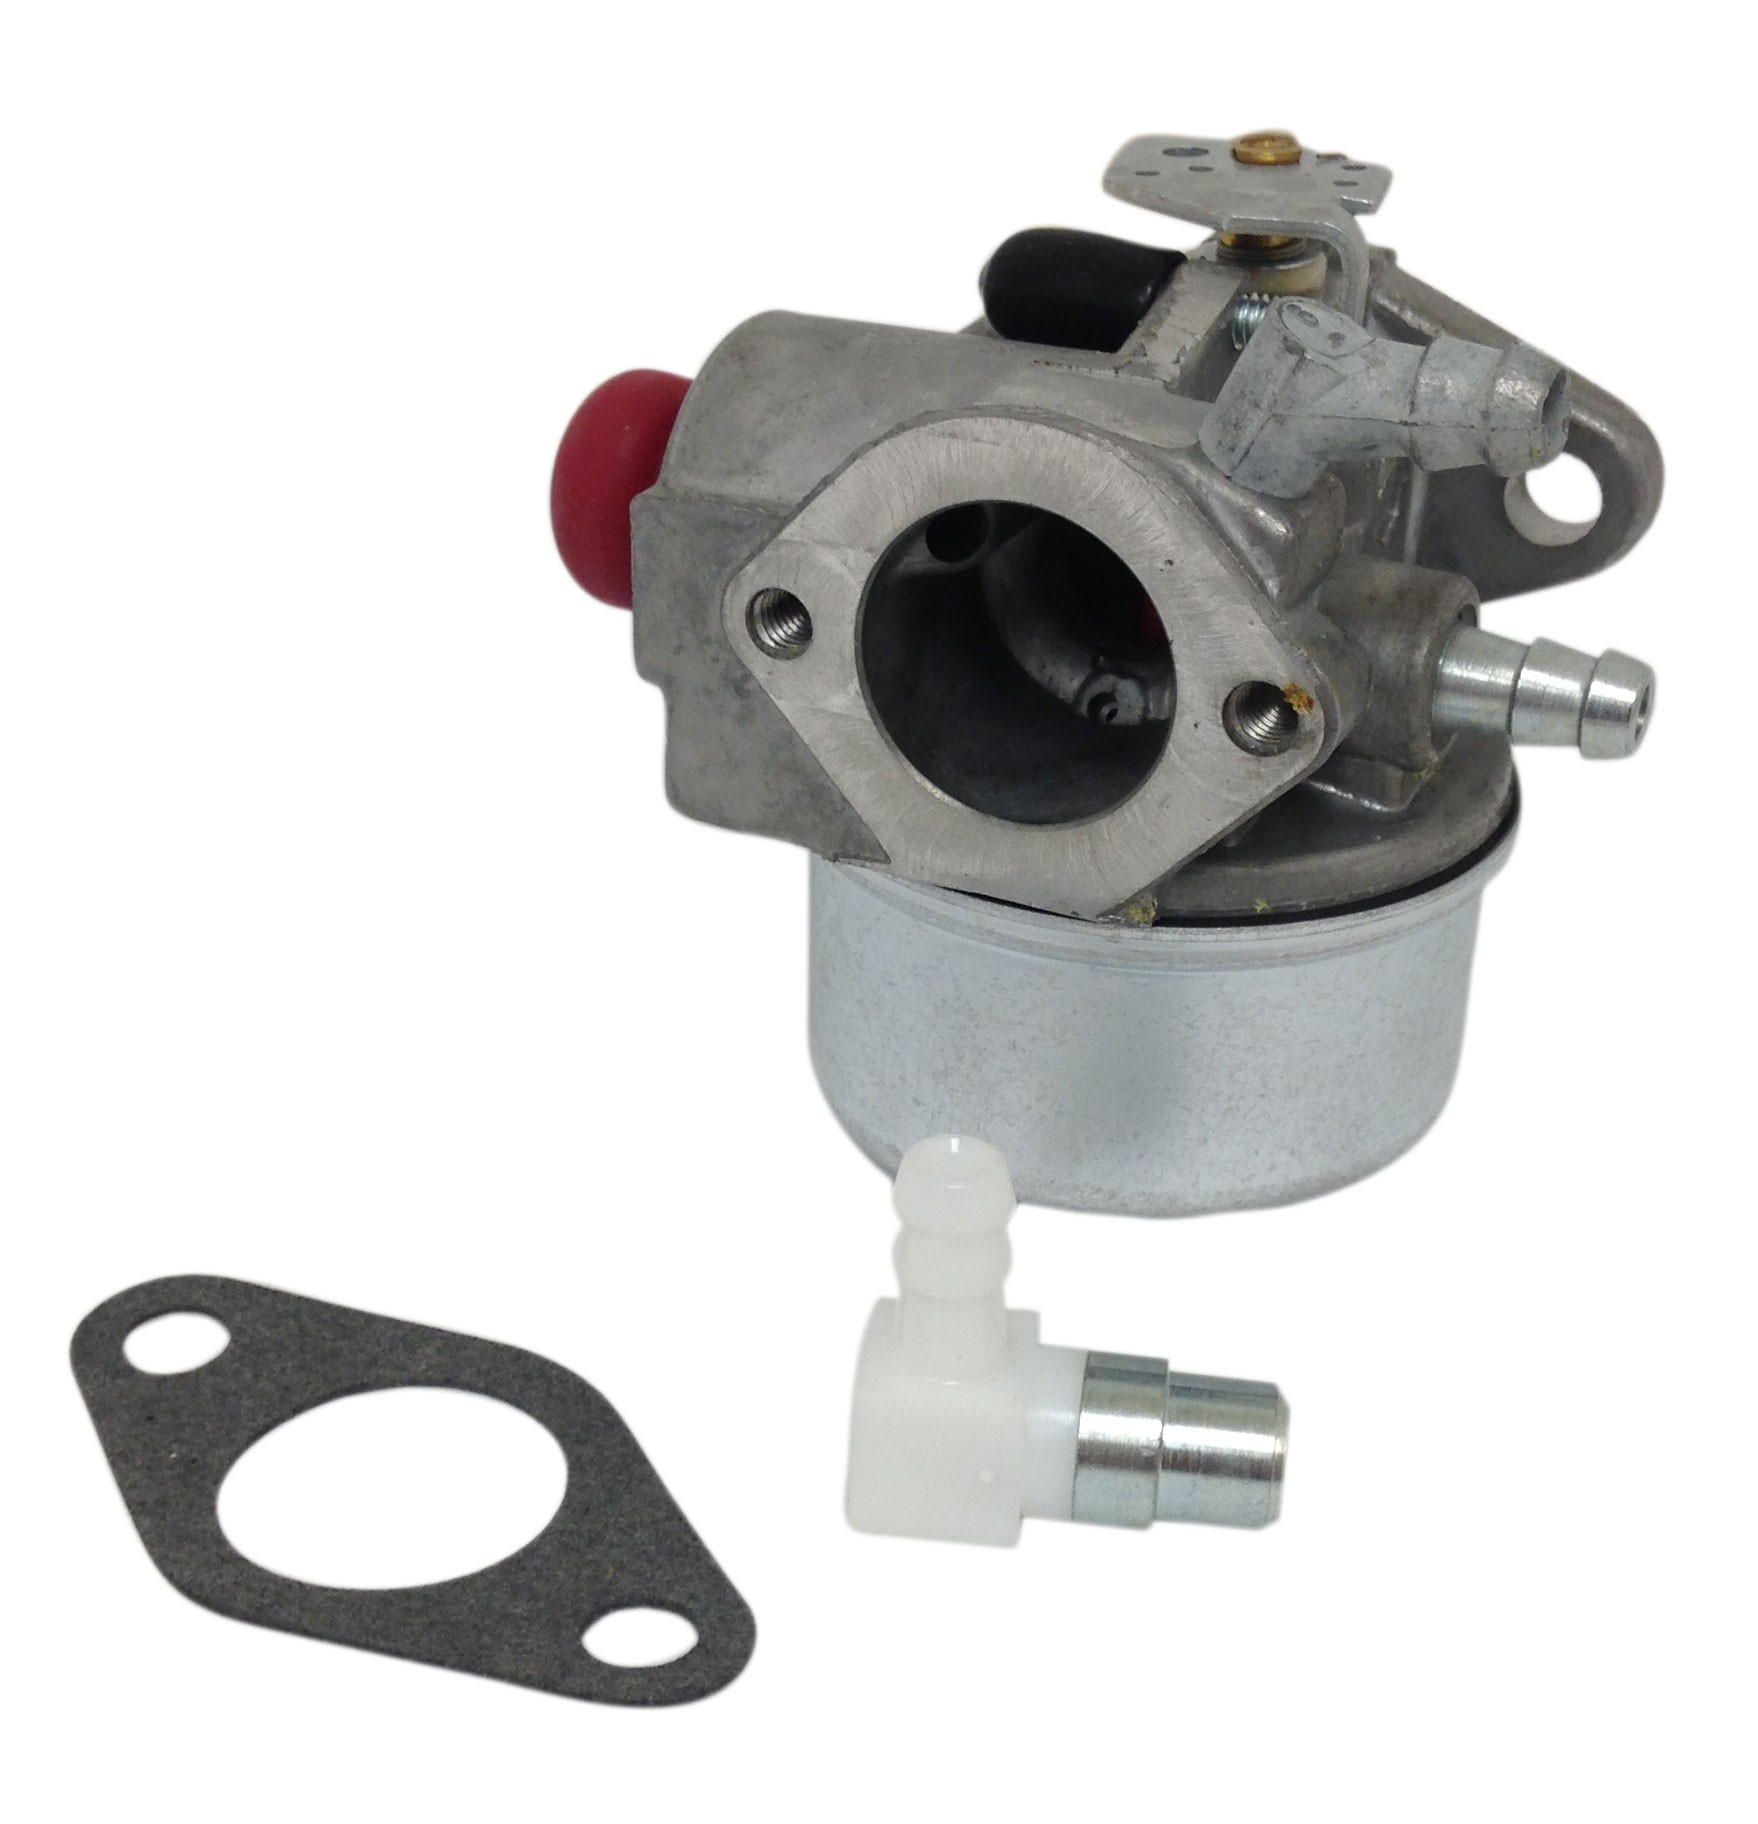 Tecumseh 6 5 Hp Engine Diagram 5hp Carburetor B My Wiring